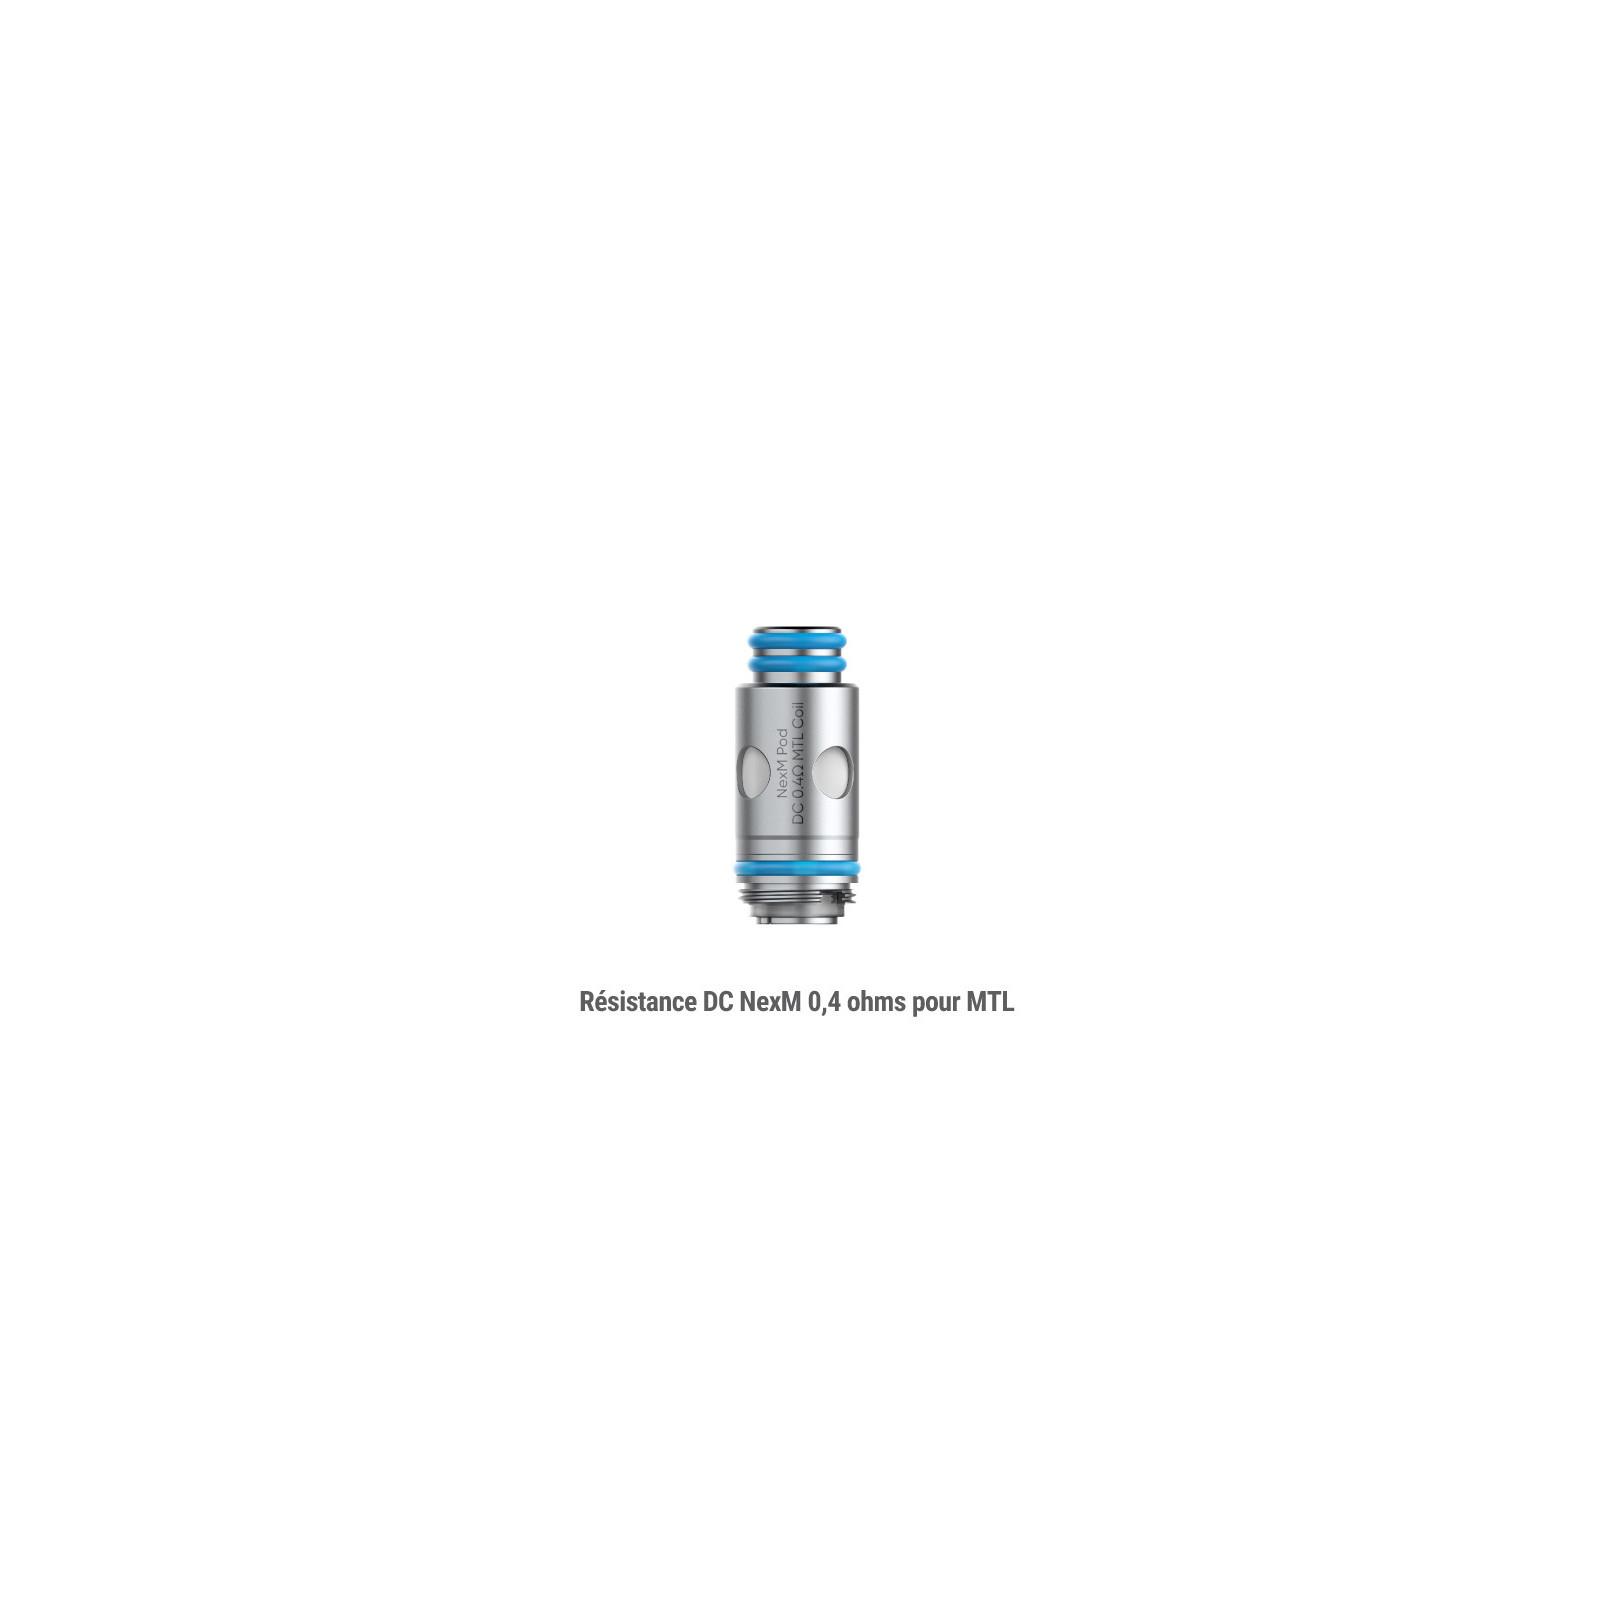 Résistances NexM MTL - Smoktech x OFRF